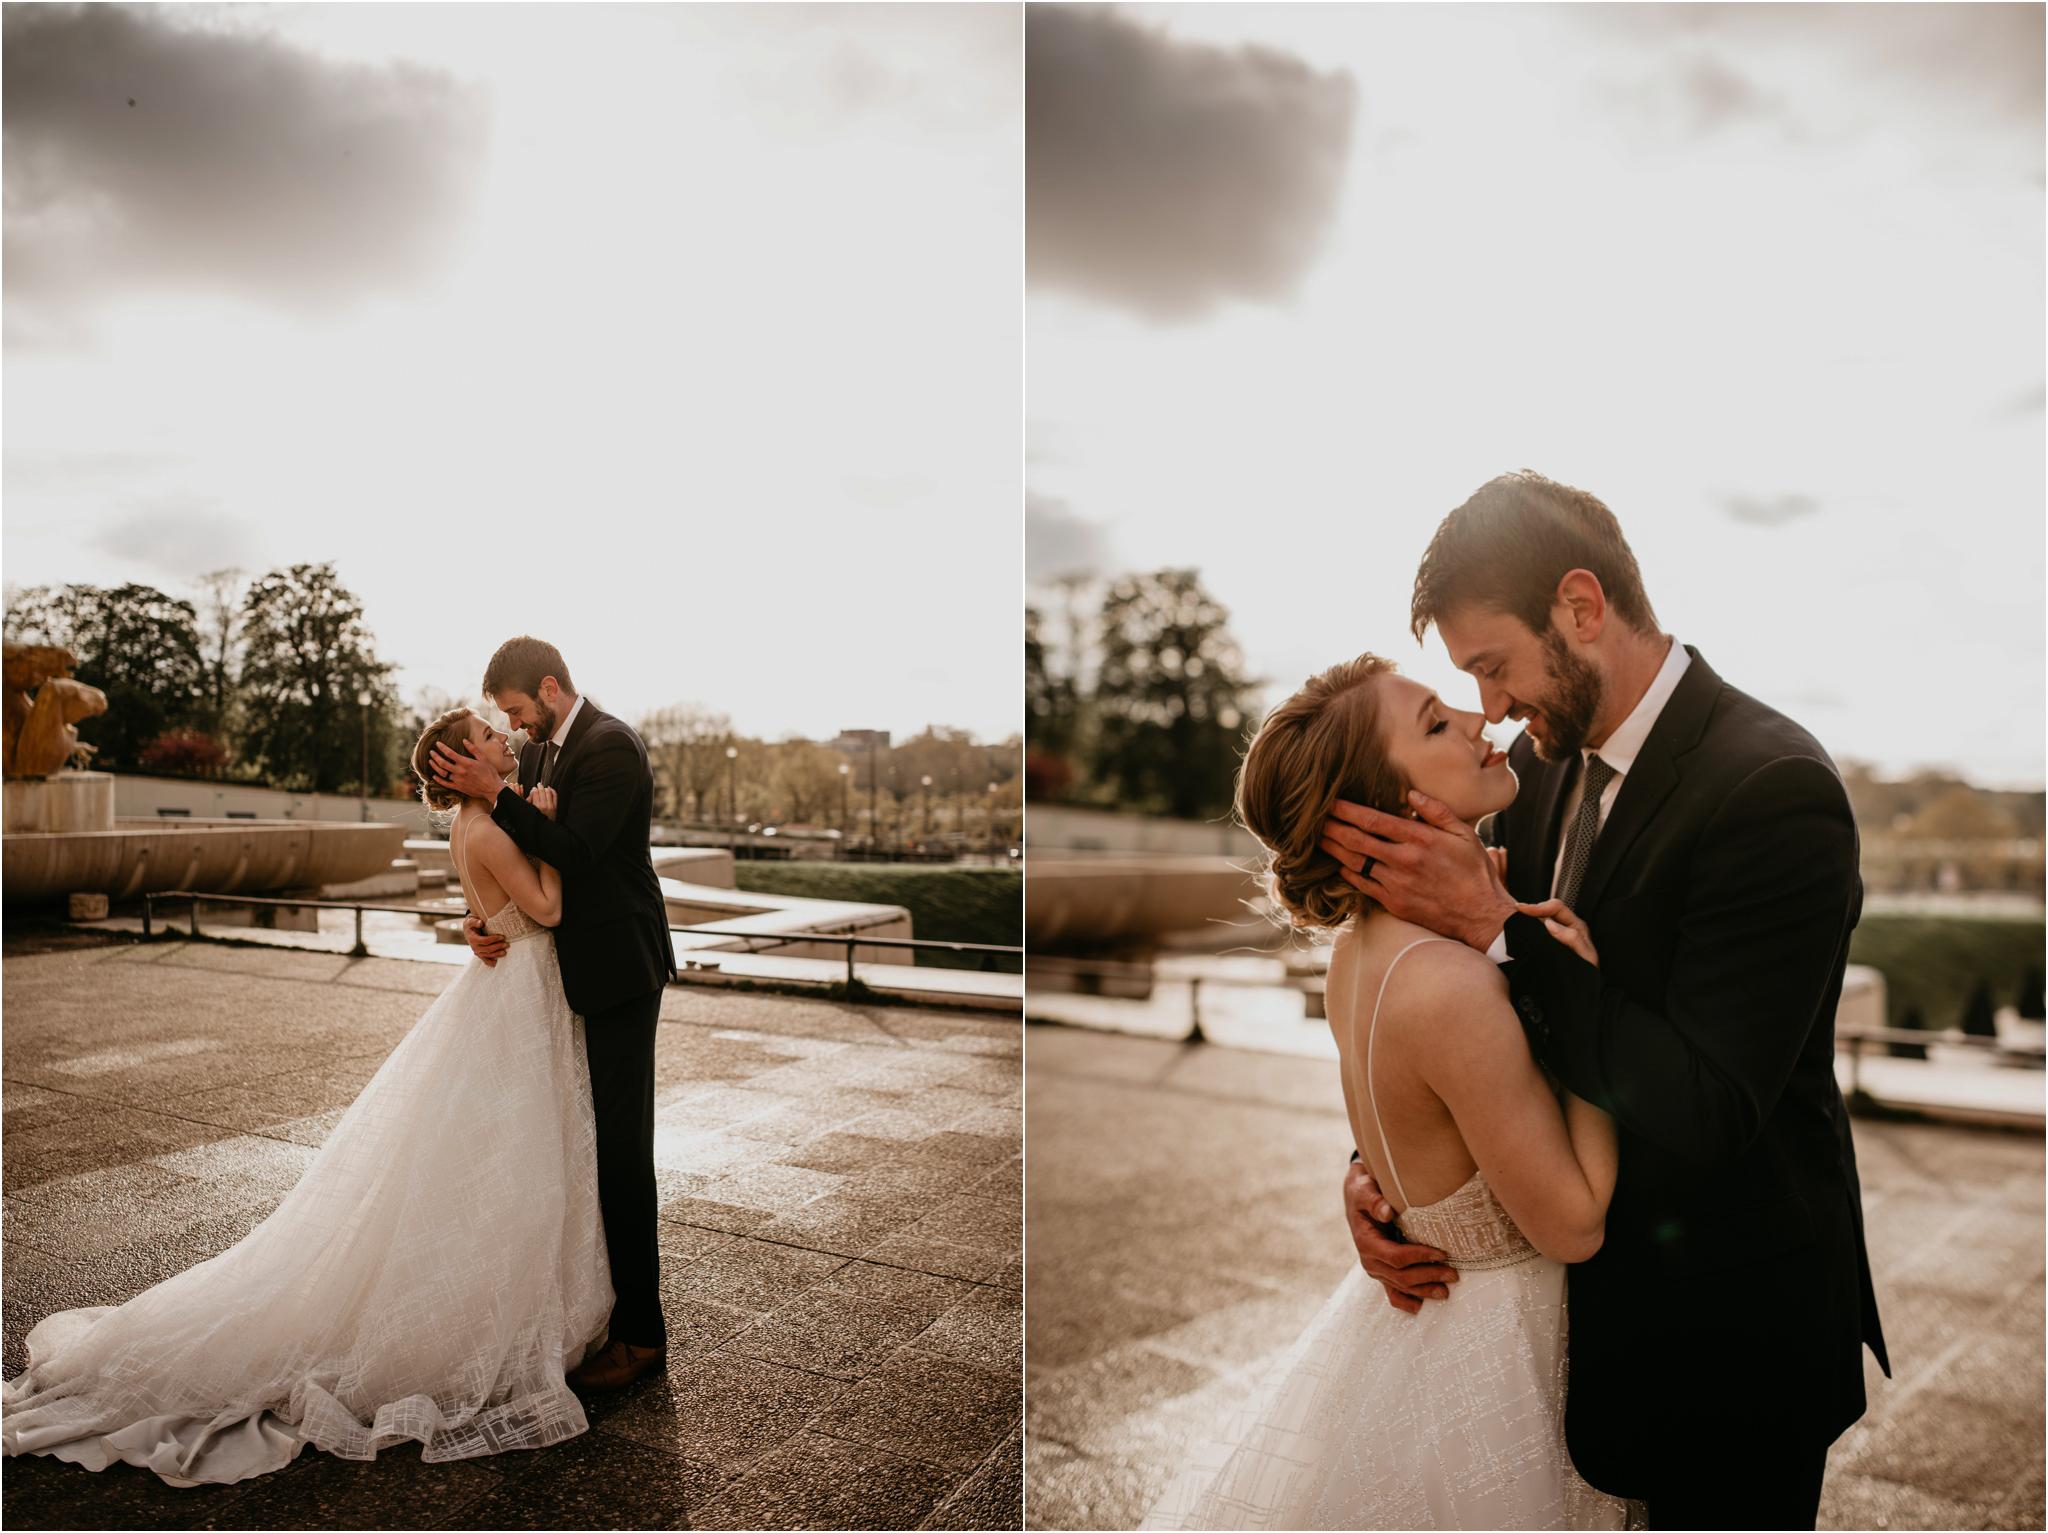 miranda-and-jared-paris-elopement-destination-wedding-photographer-067.jpg